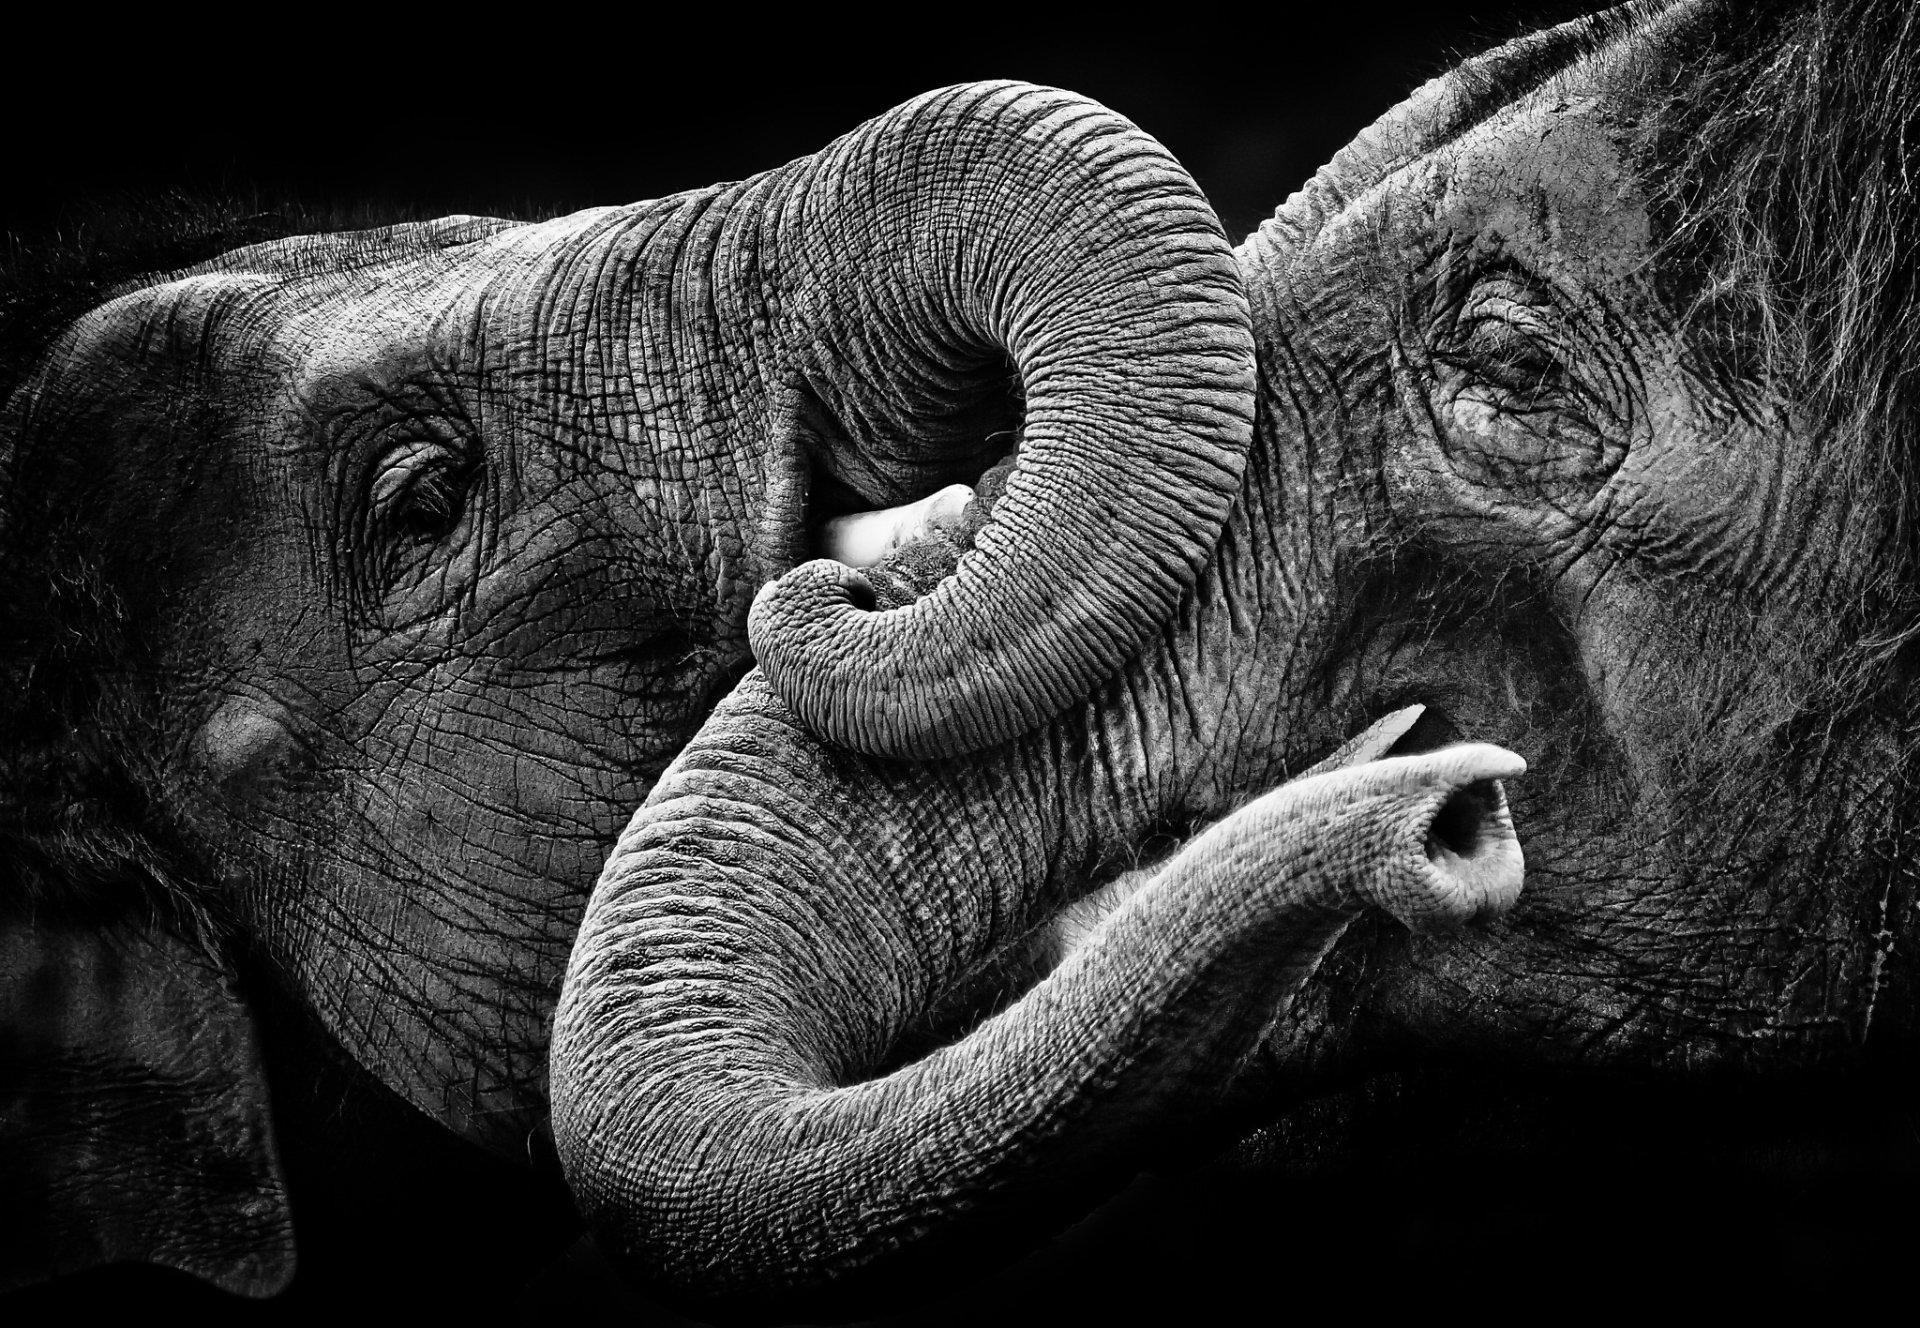 Elephant HD Wallpaper   Background Image   2048x1416   ID ...